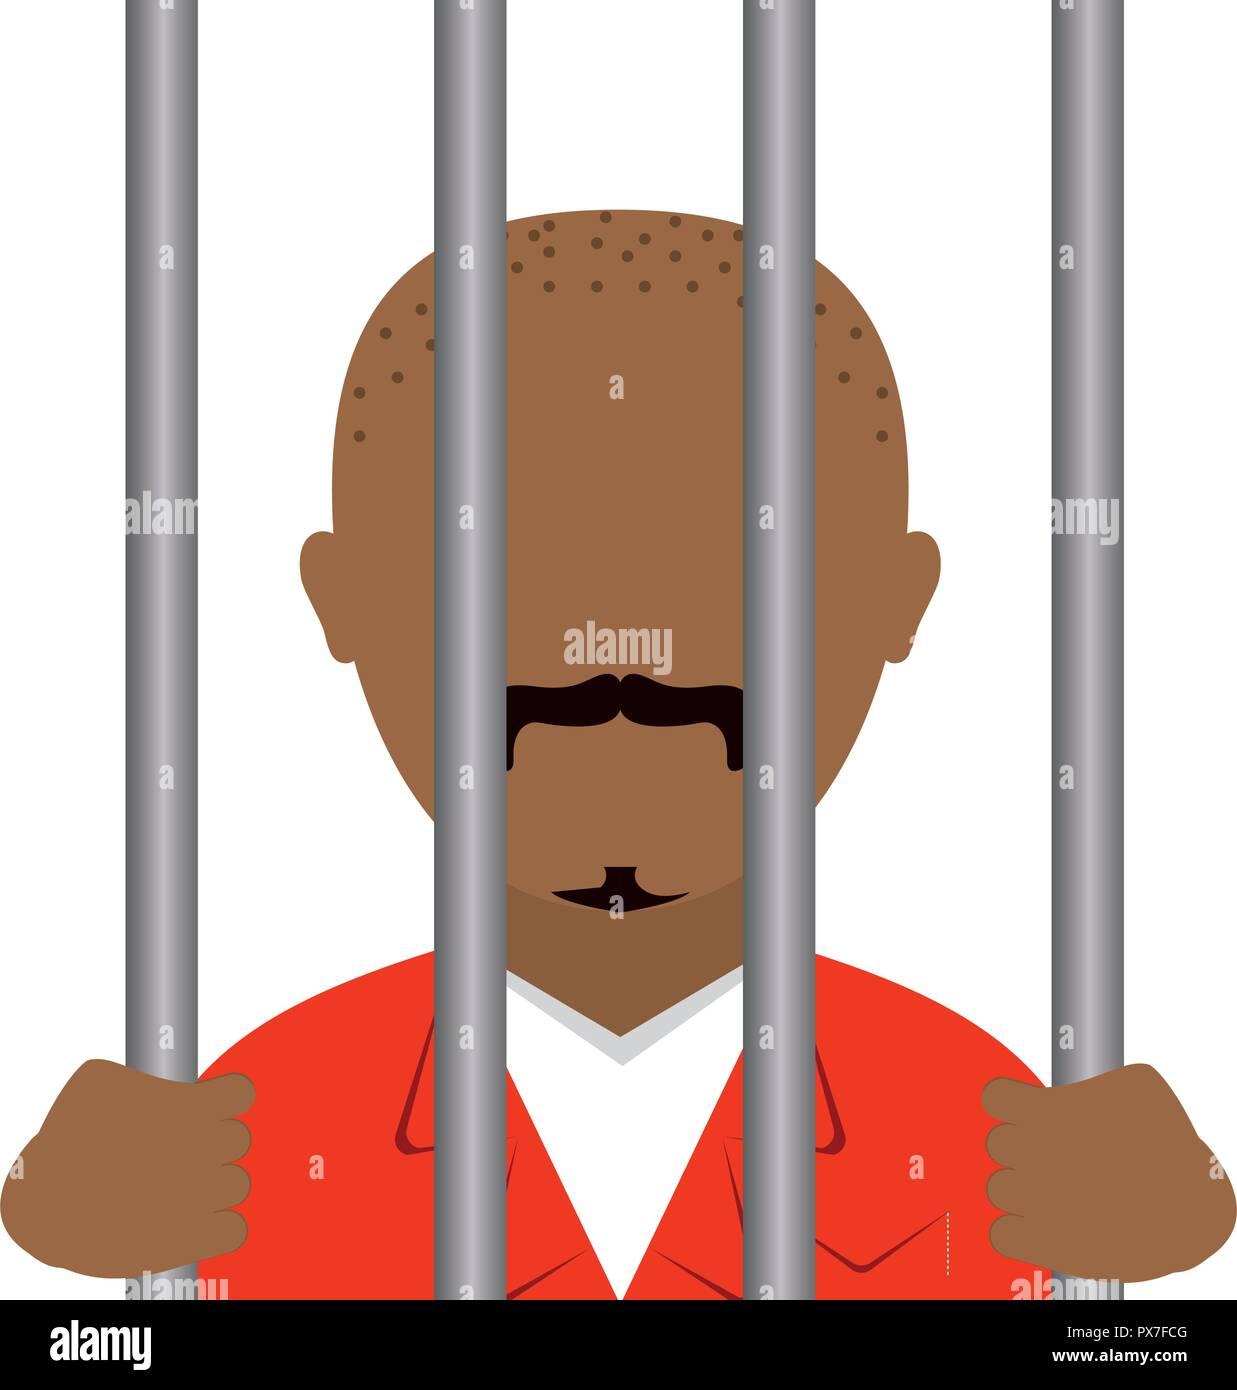 danger bandit in jail avatar character vector illustration design - Stock Image